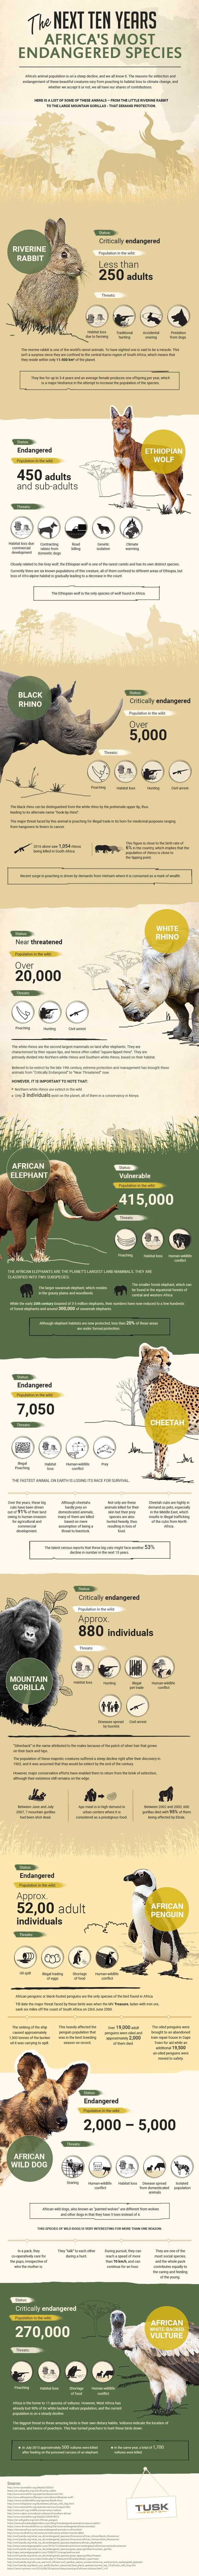 endangered wildlife species in africa Africa's Endangered Wildlife Species Tusk Infographic Africa Most Endangered Species